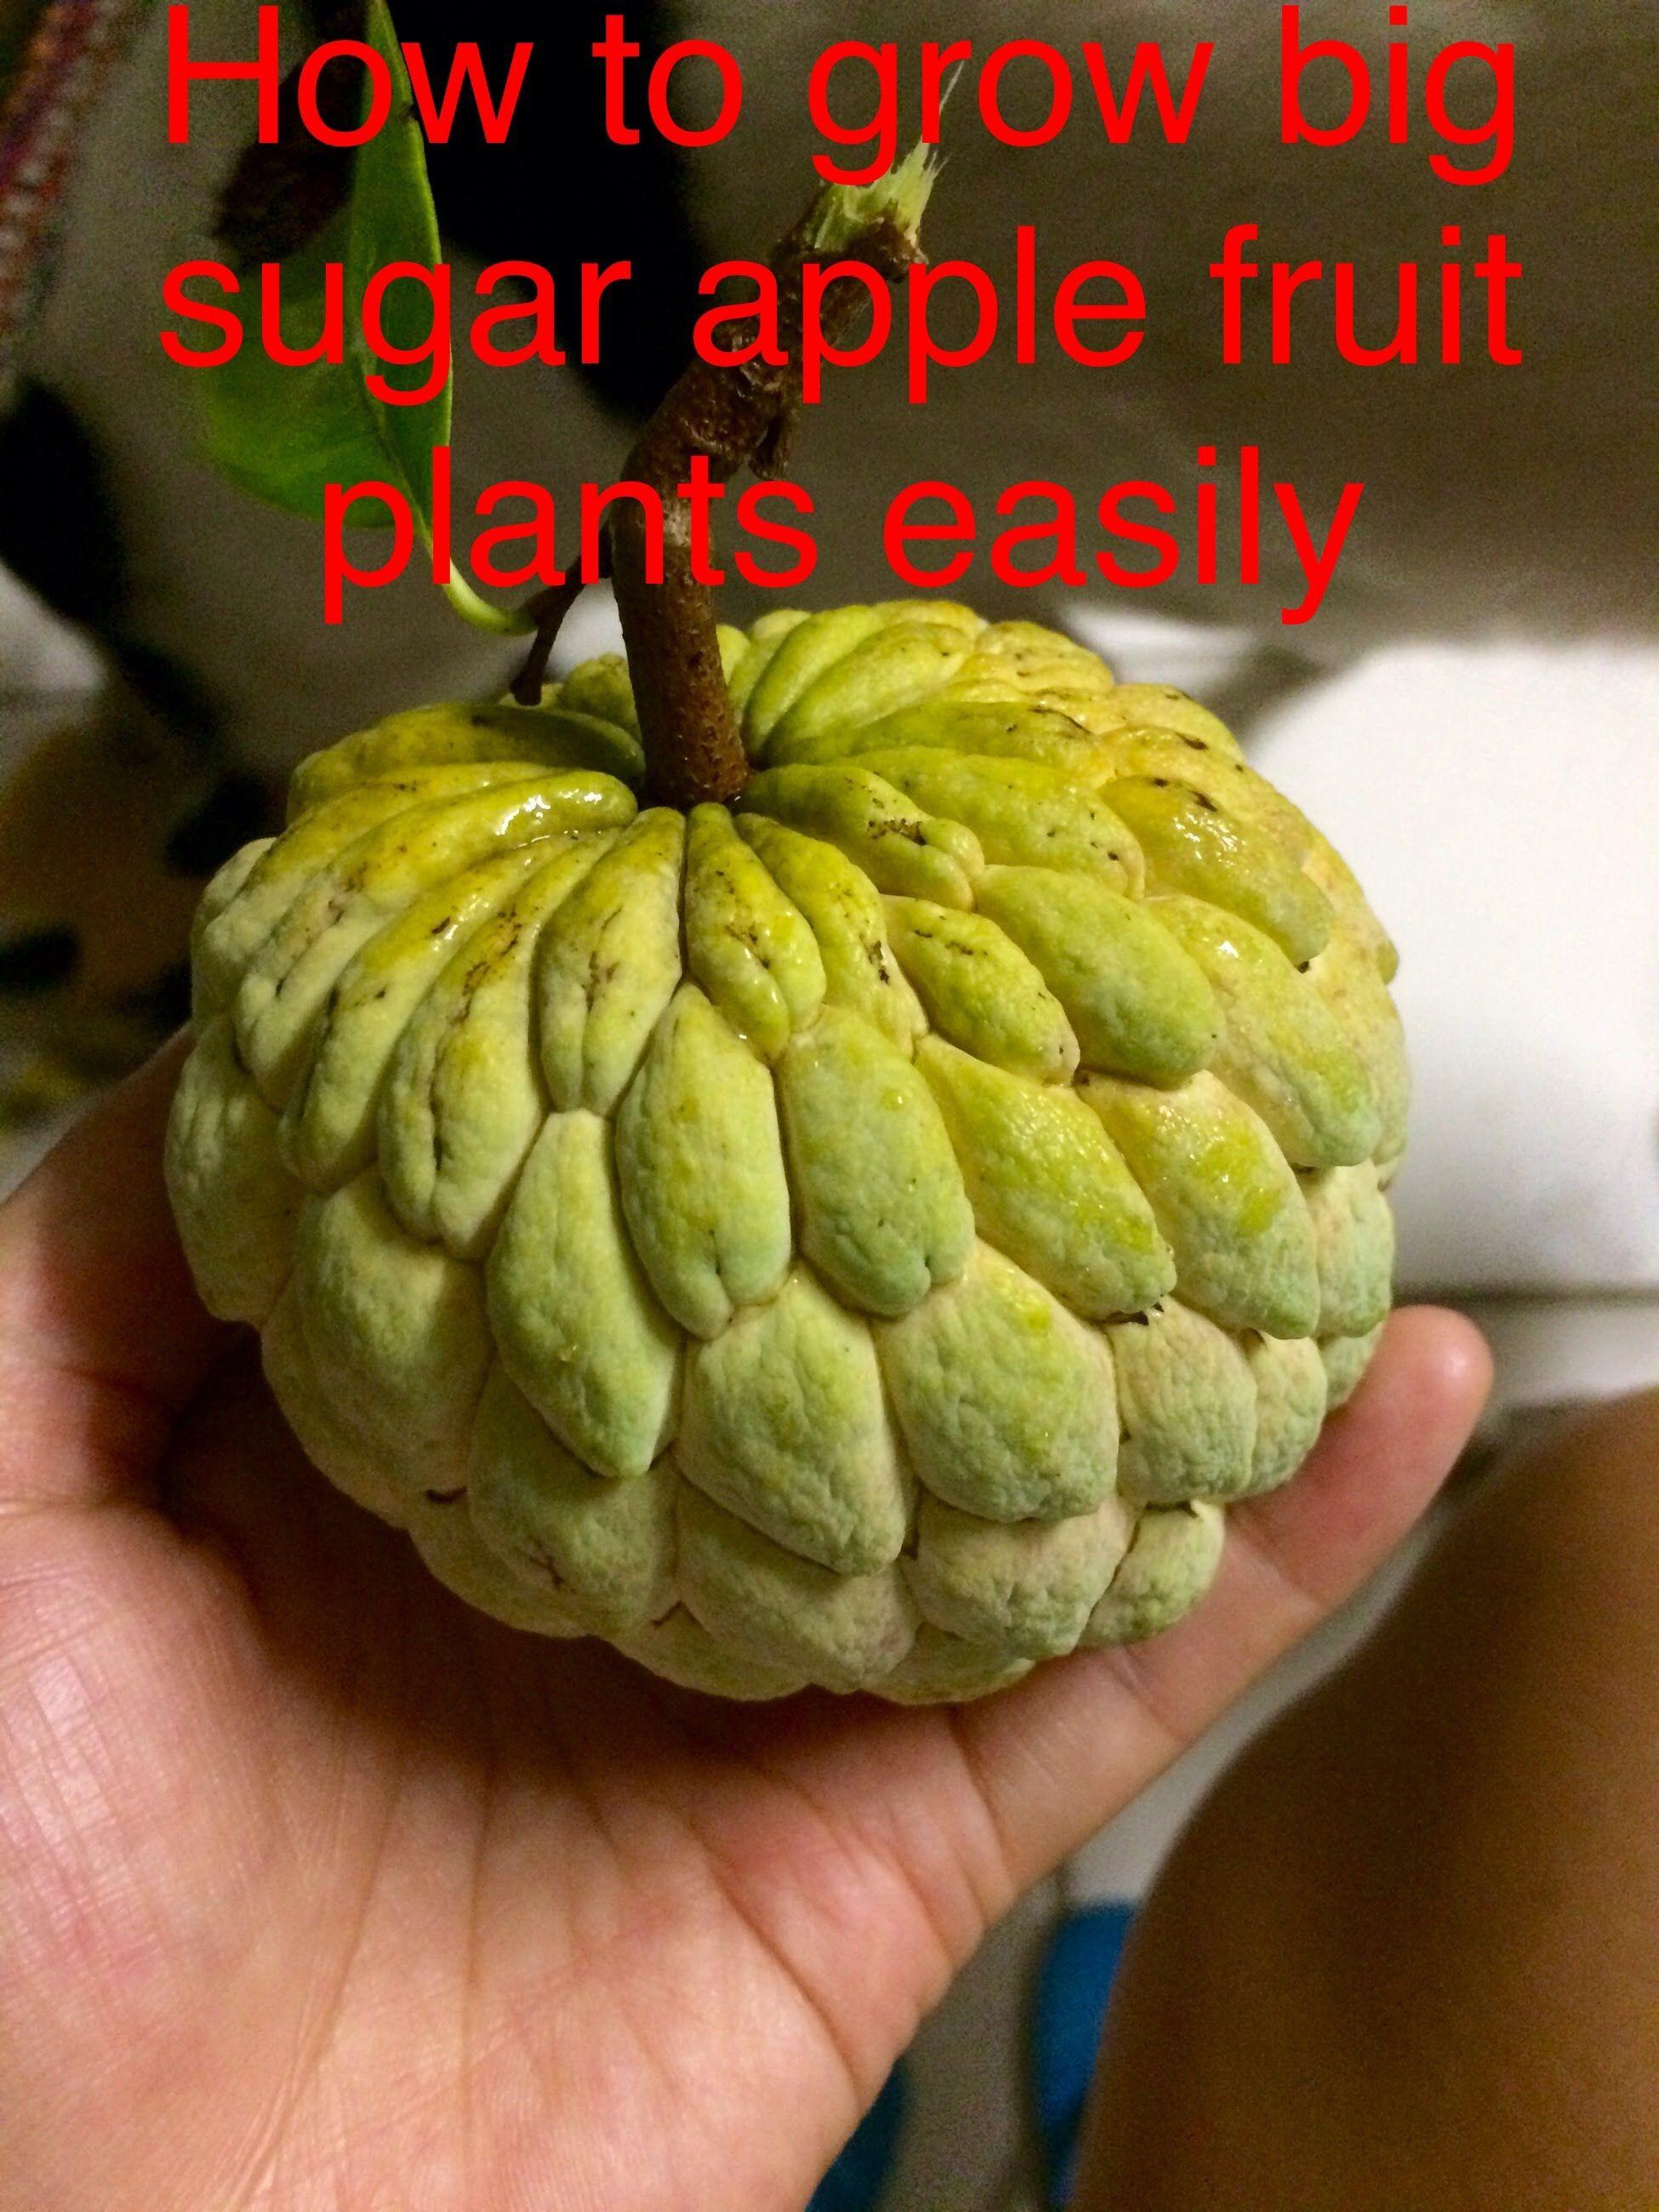 How To Grow Huge Sugar Apple Fruit Plants Easily Growing Fruit Trees Sugar Apple Fruit Apple Fruit